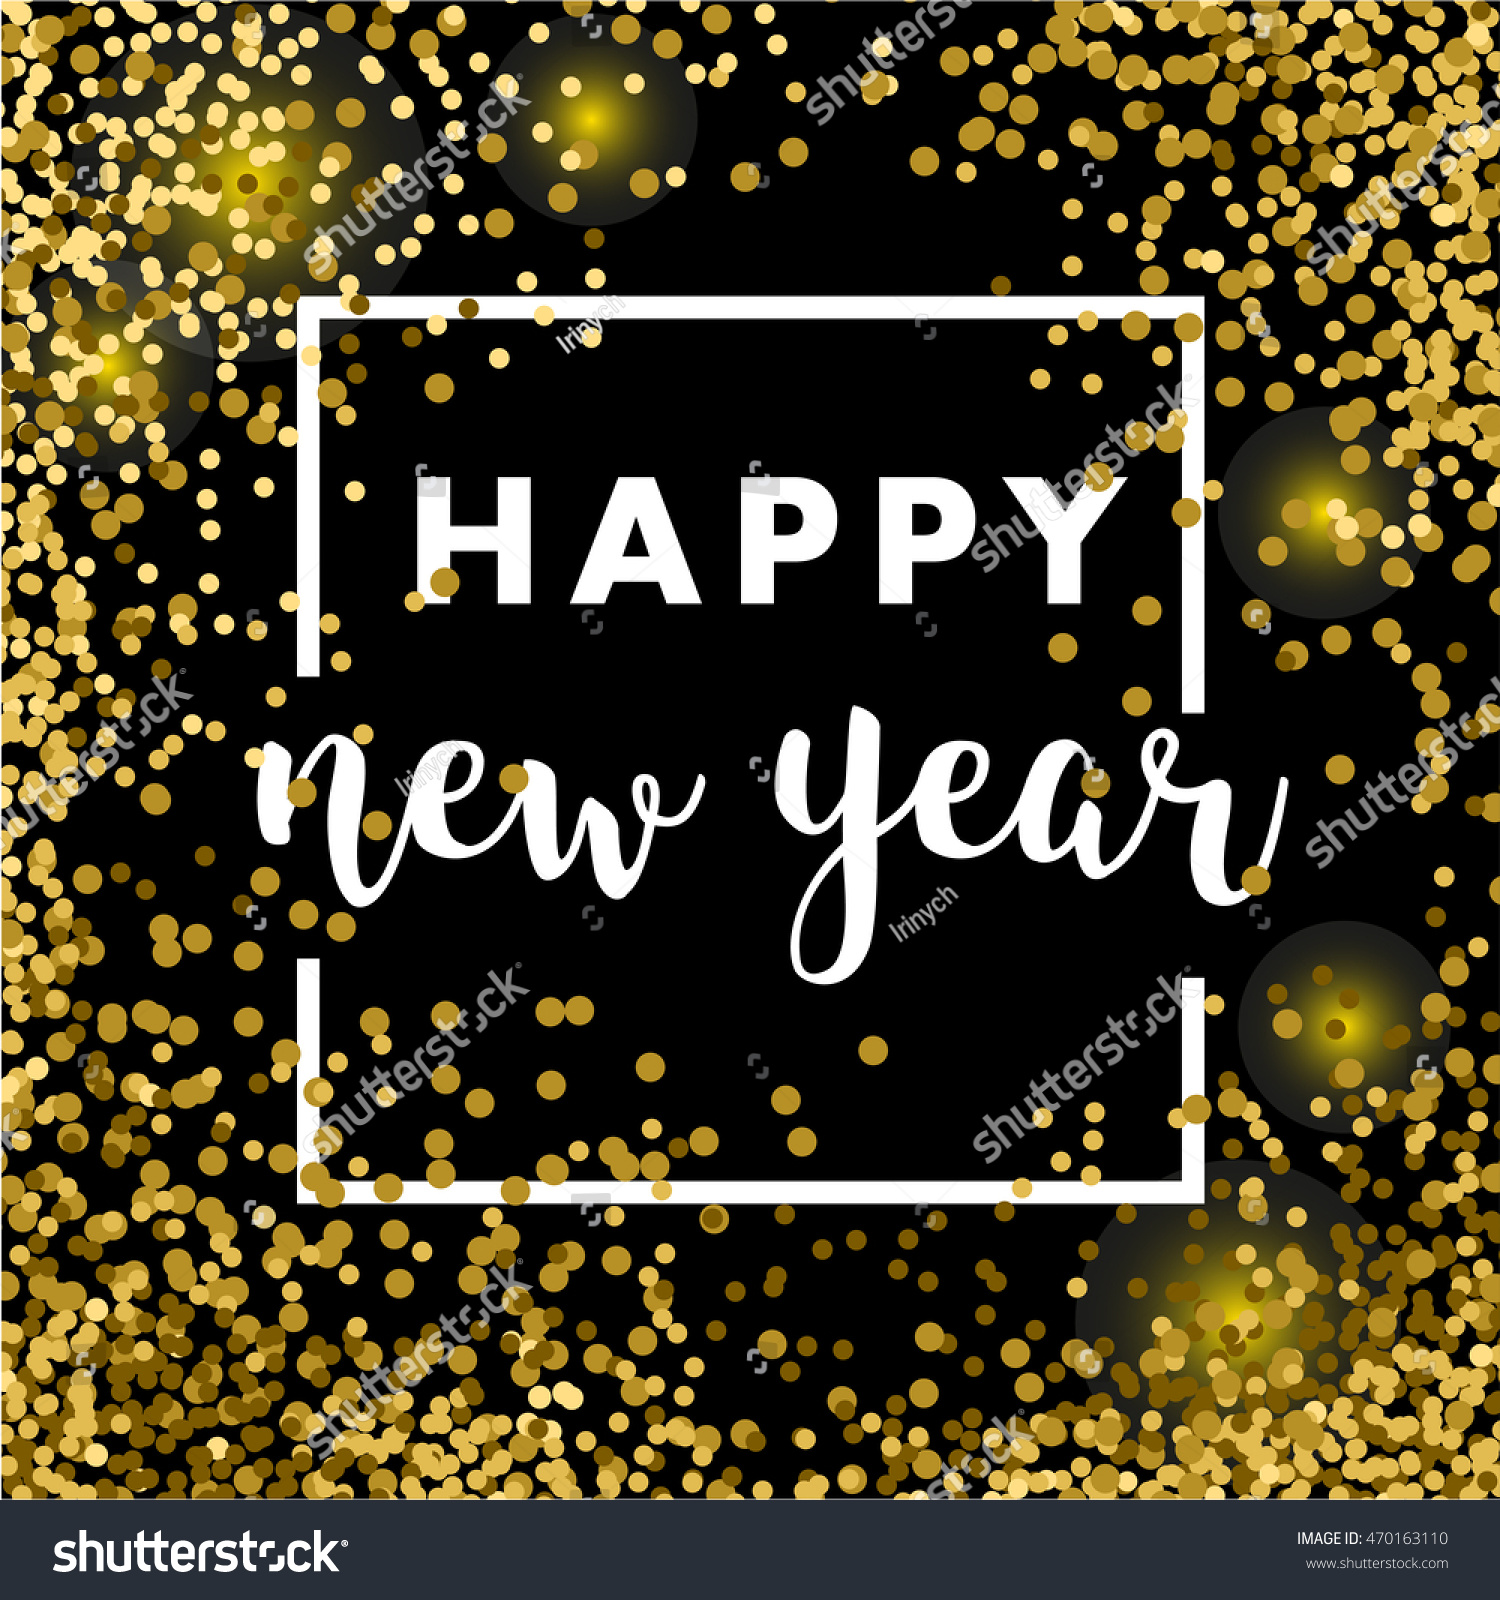 dark golden glitter happy new year 2017 card glowing celebrate background vector illustration